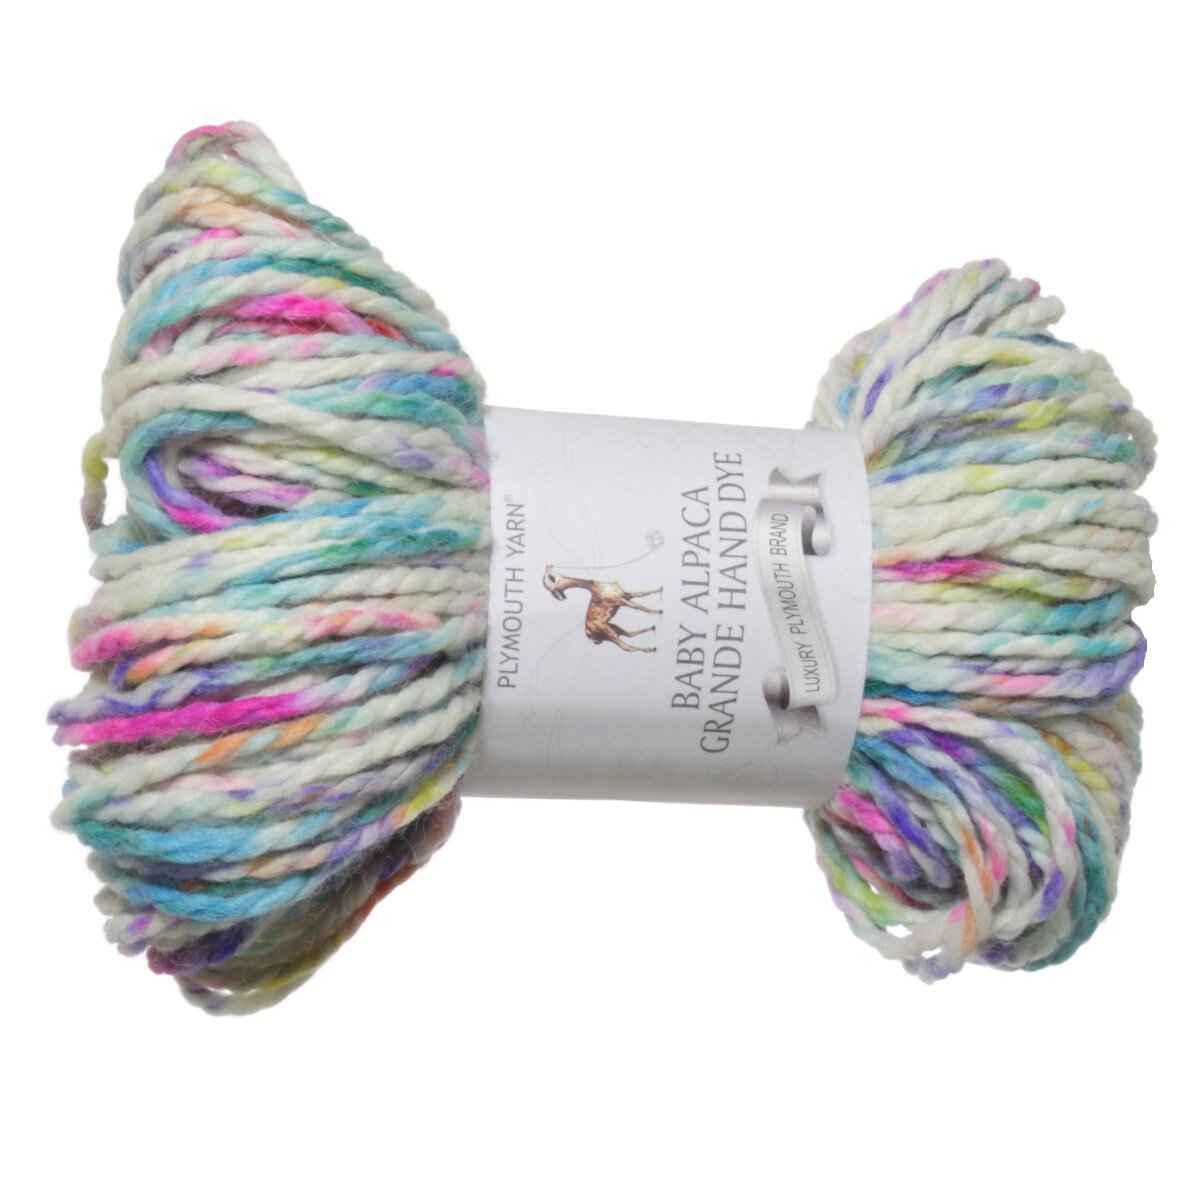 Plymouth Yarn Baby Alpaca Grande Hand Dye Yarn Reviews At